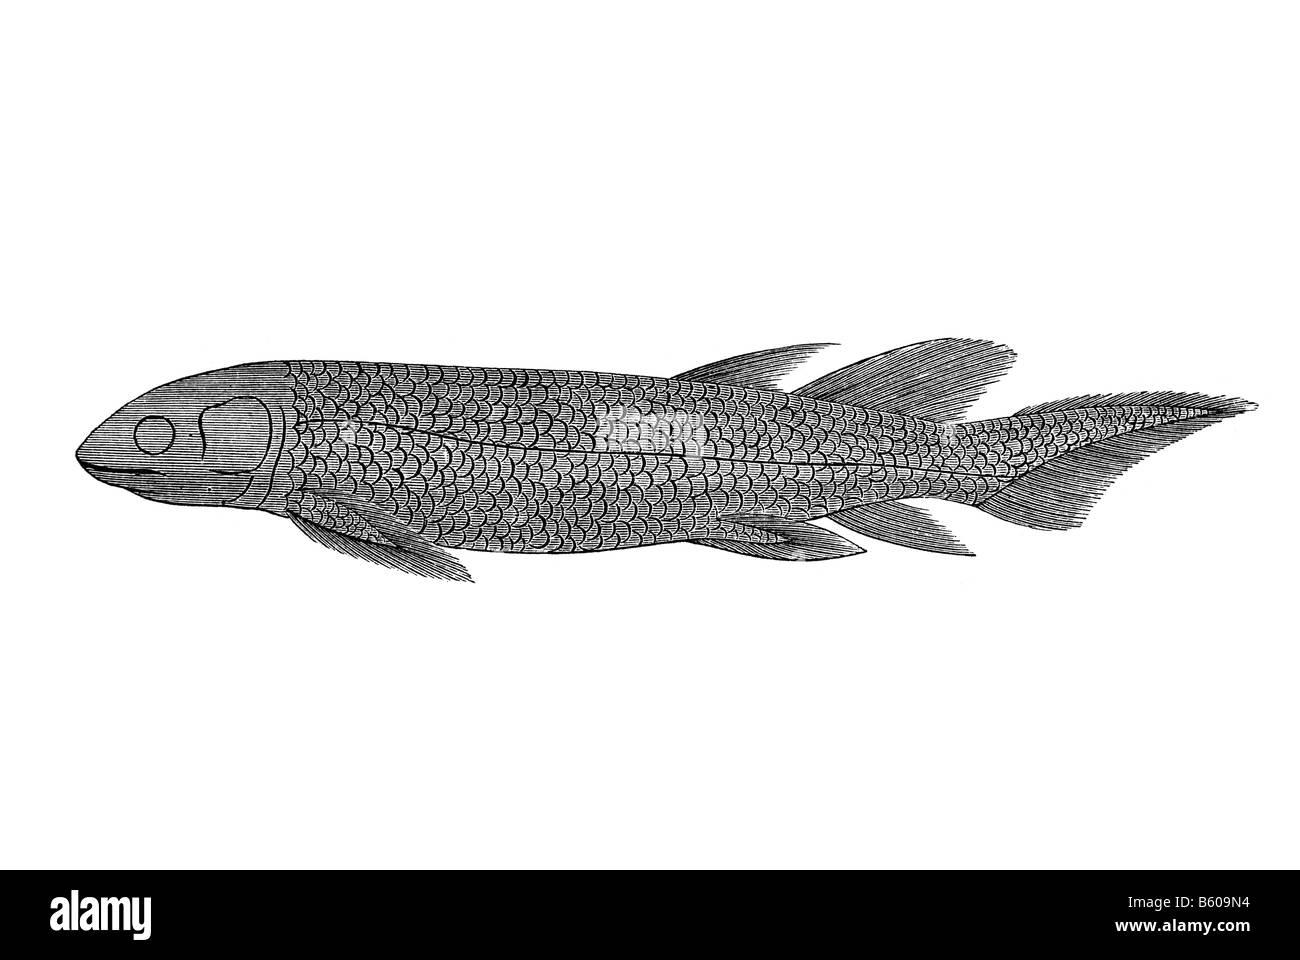 Lungfish Dipterus valenciennesi fossil fish - Stock Image